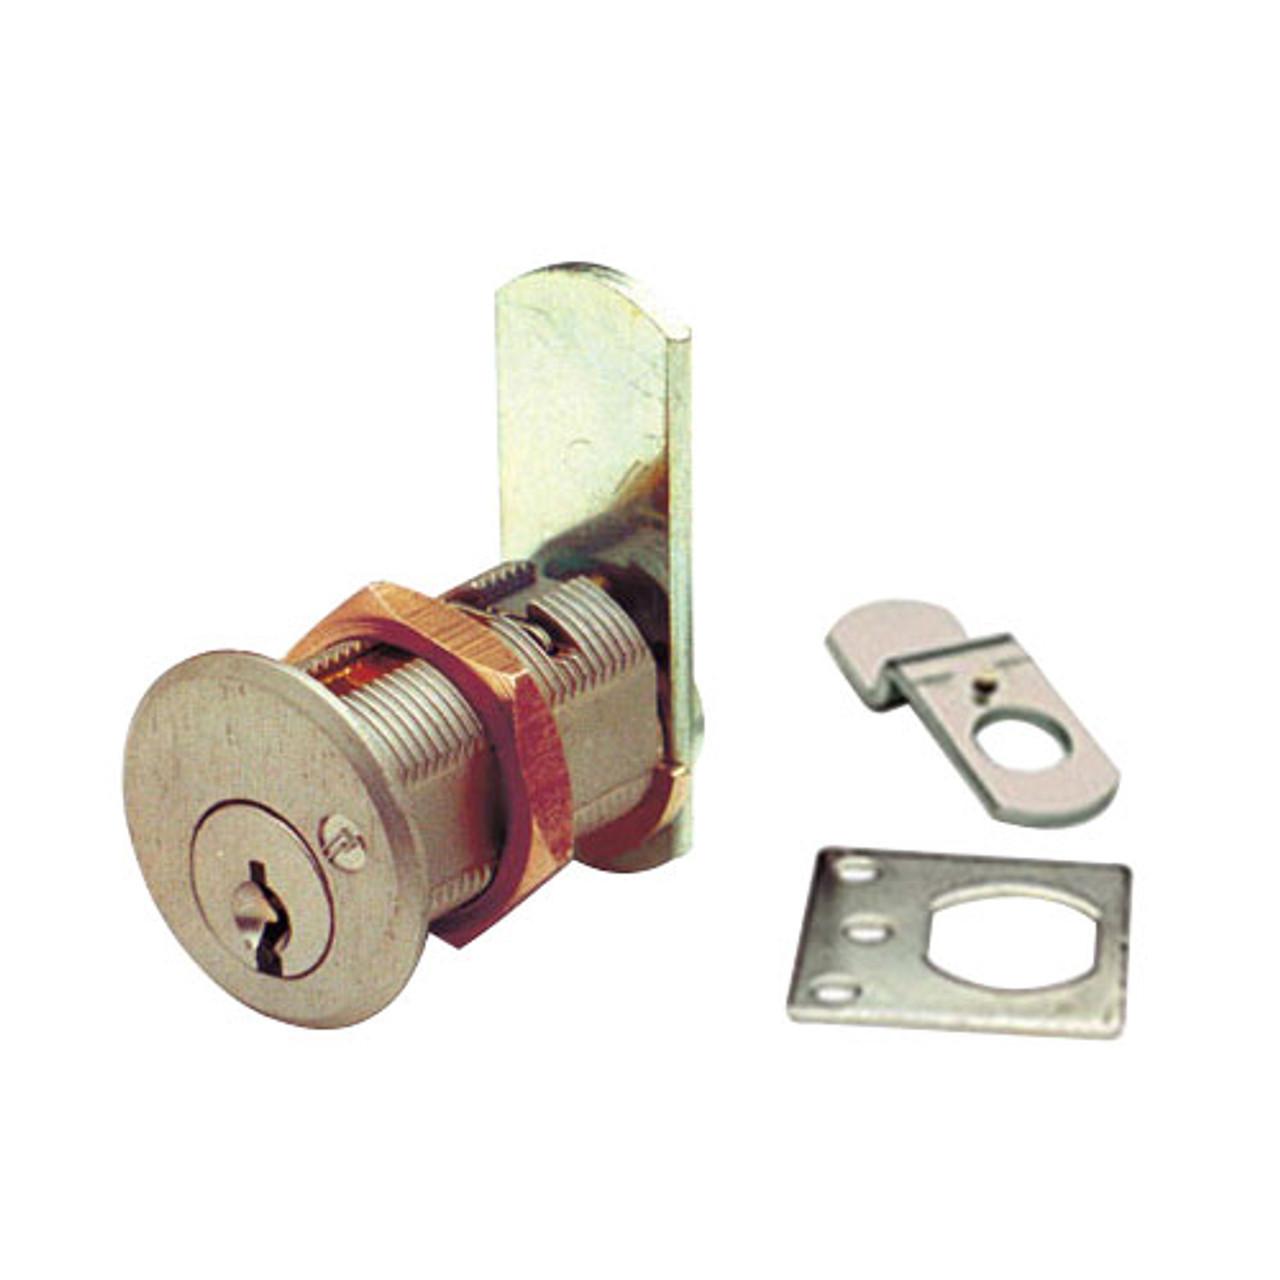 Olympus DCN3-KA101-US3 Cam Locks in Bright Brass Finish